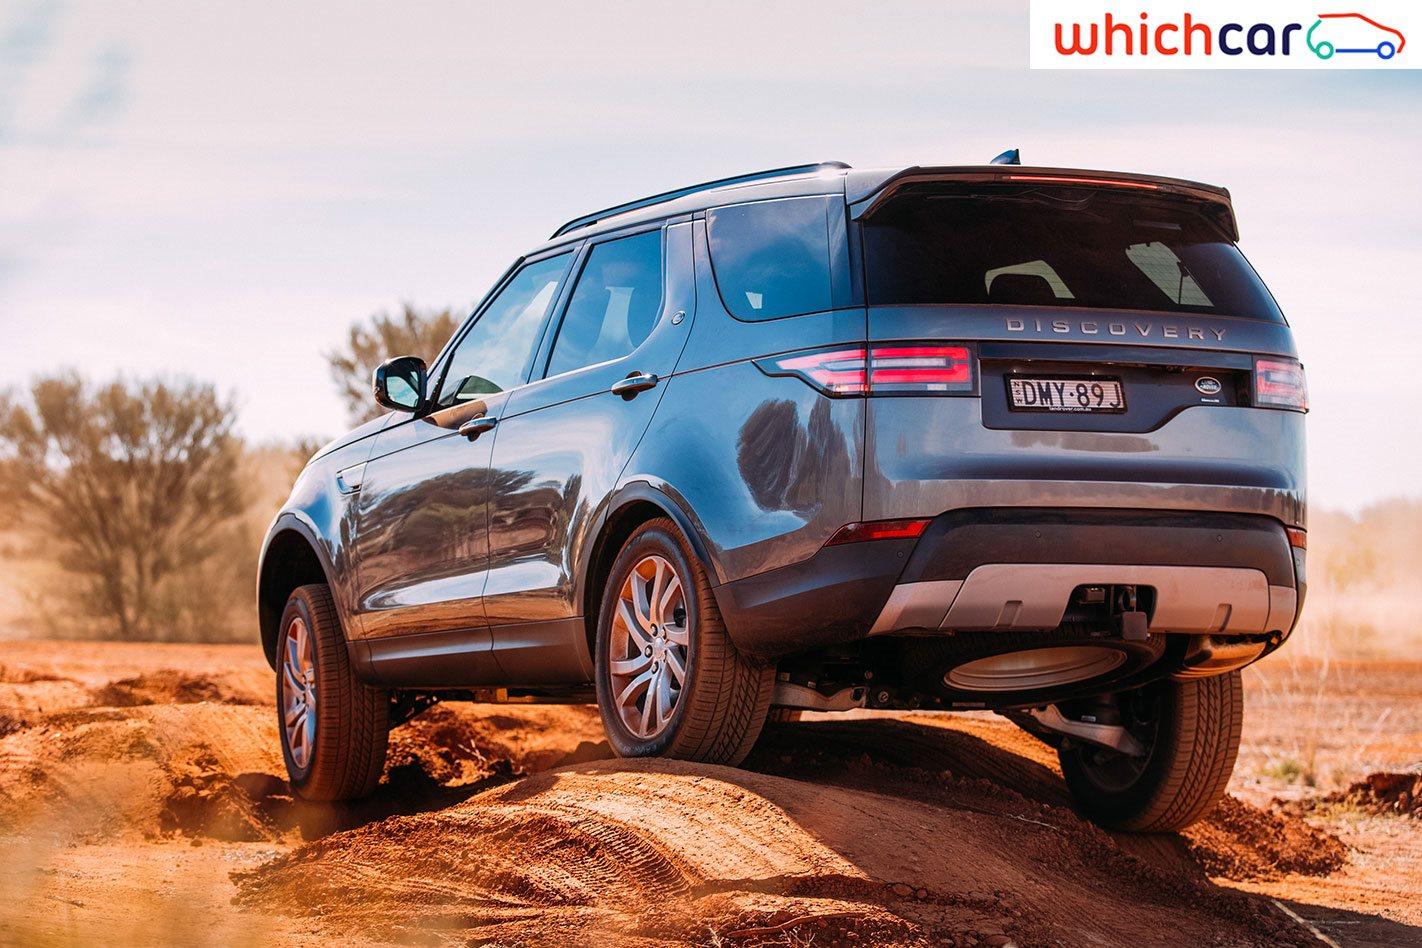 מבריק Land Rover Discovery Review, Price & Features BC-71